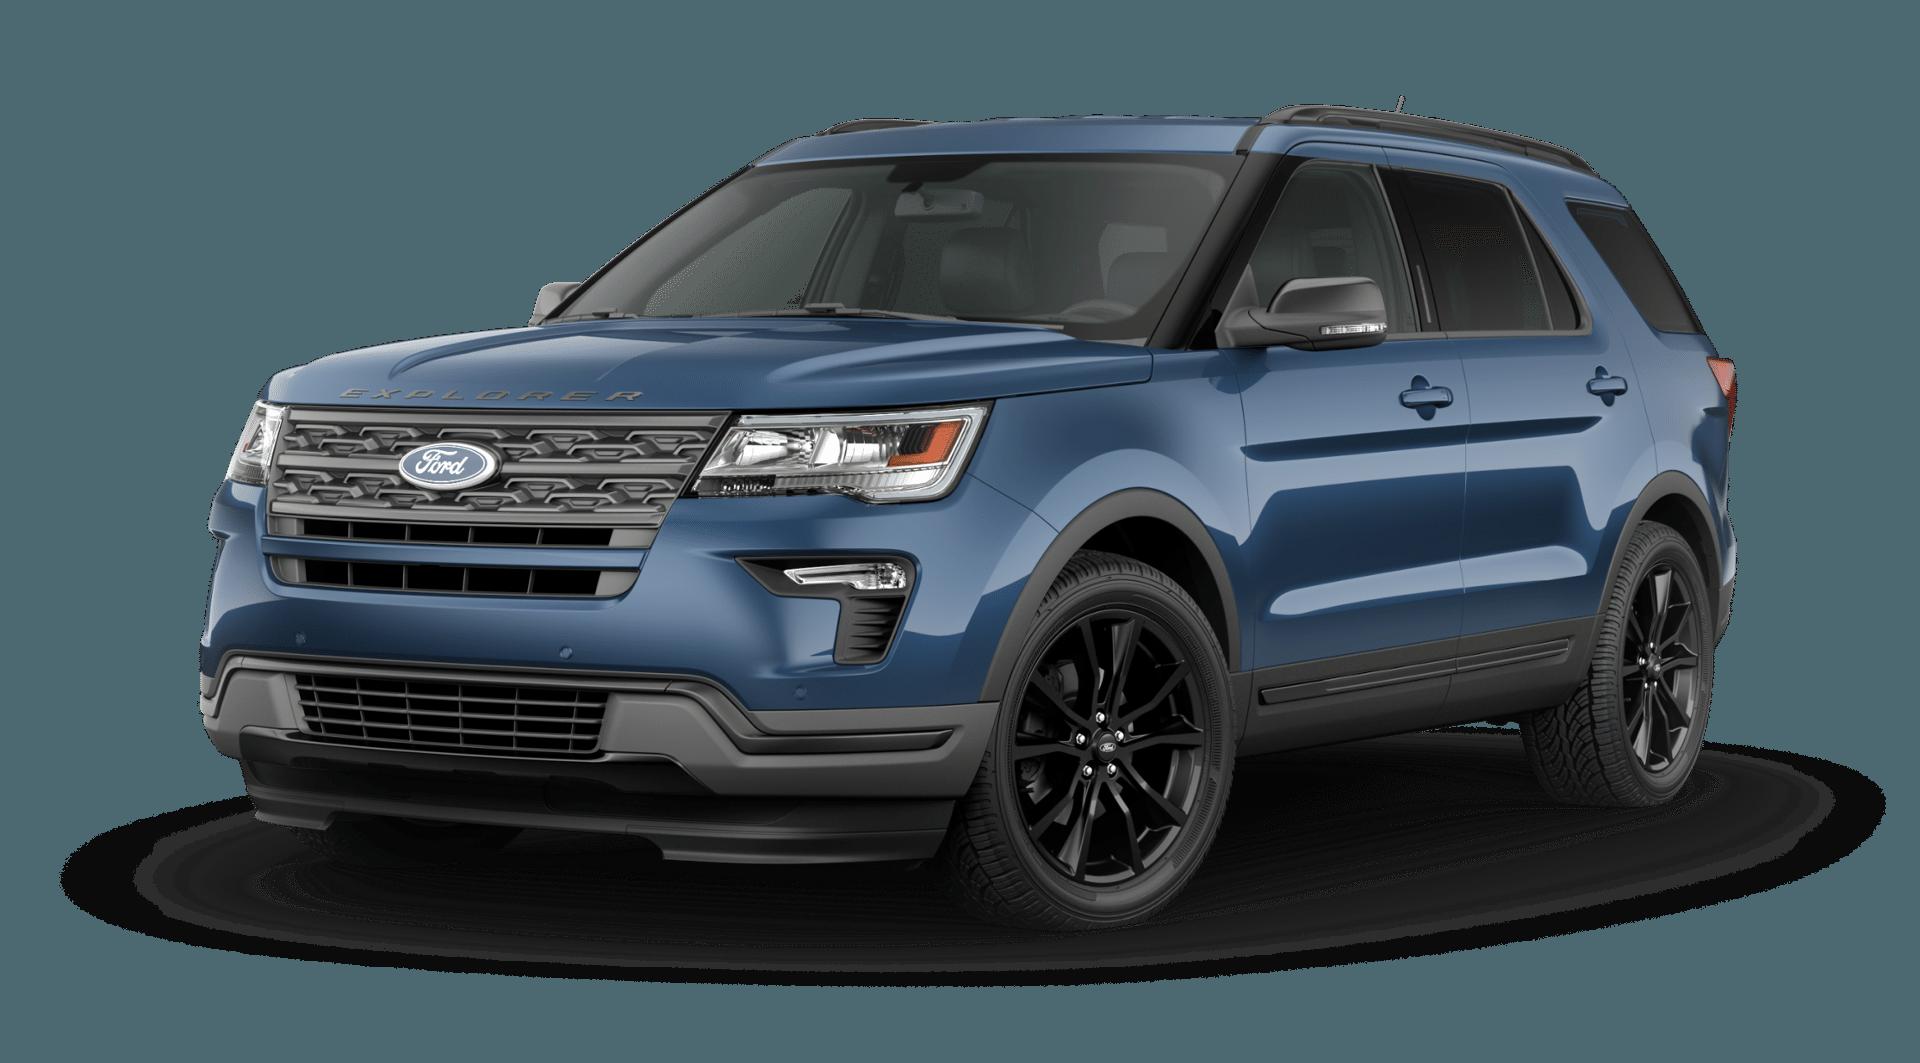 New ford specials lease deals rebates incentives los angeles